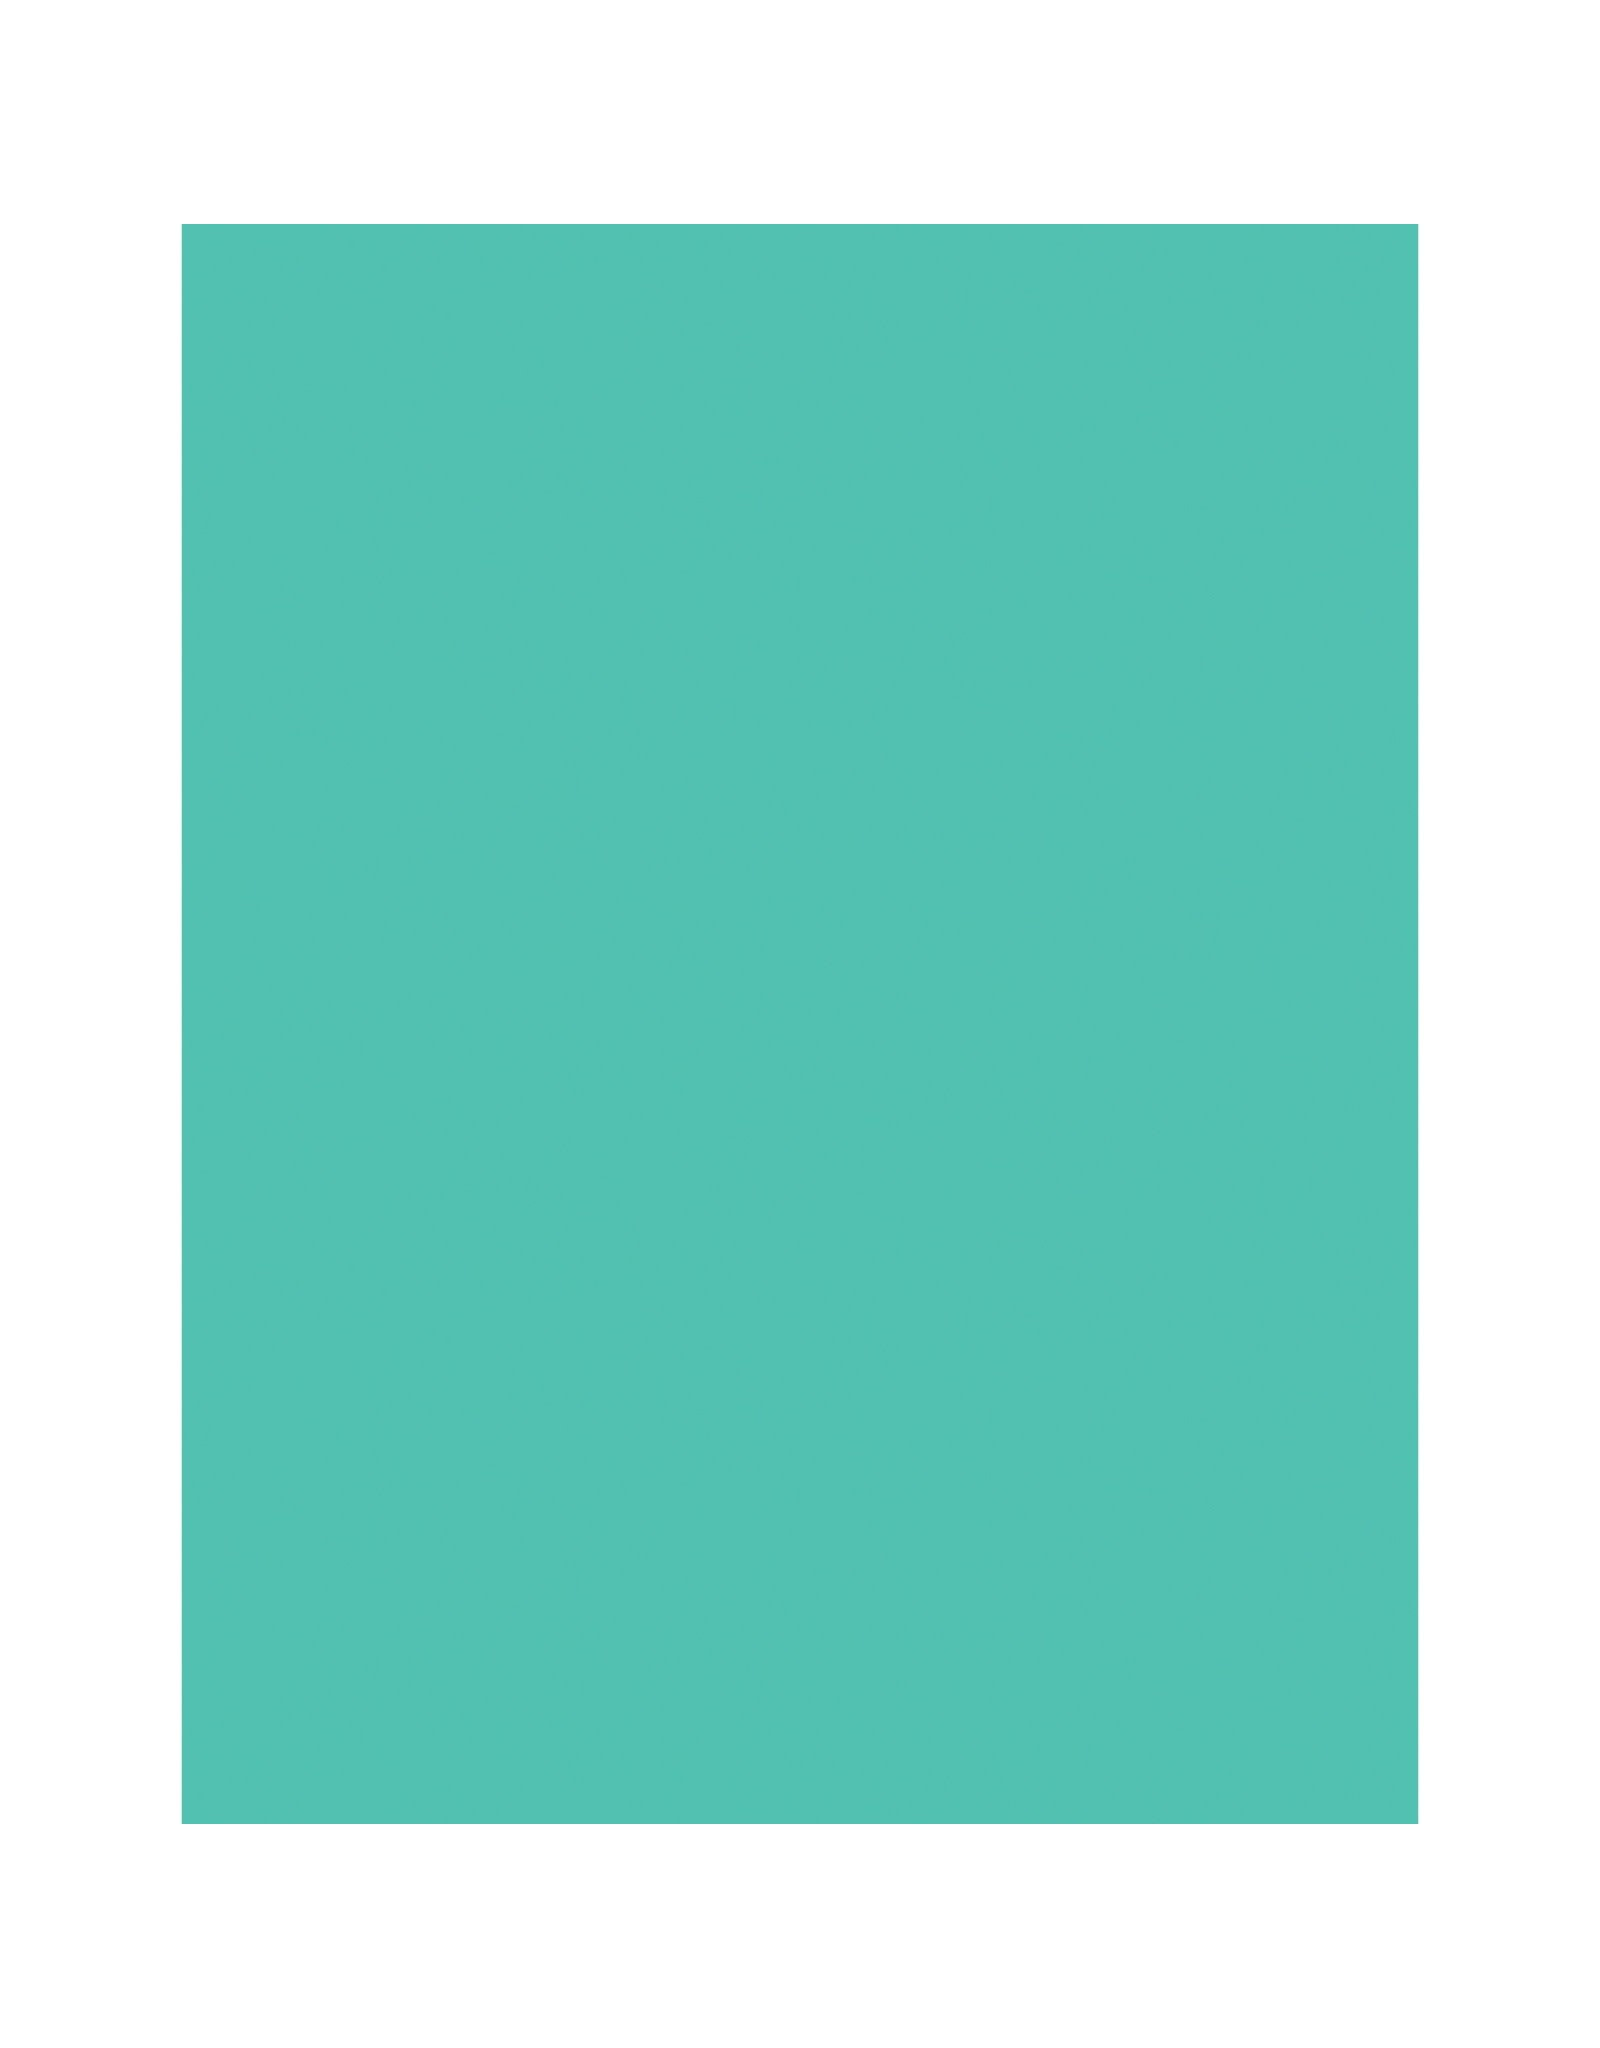 Bazzill Bazzill Card Shoppe 8.5x11 - Mint Julep